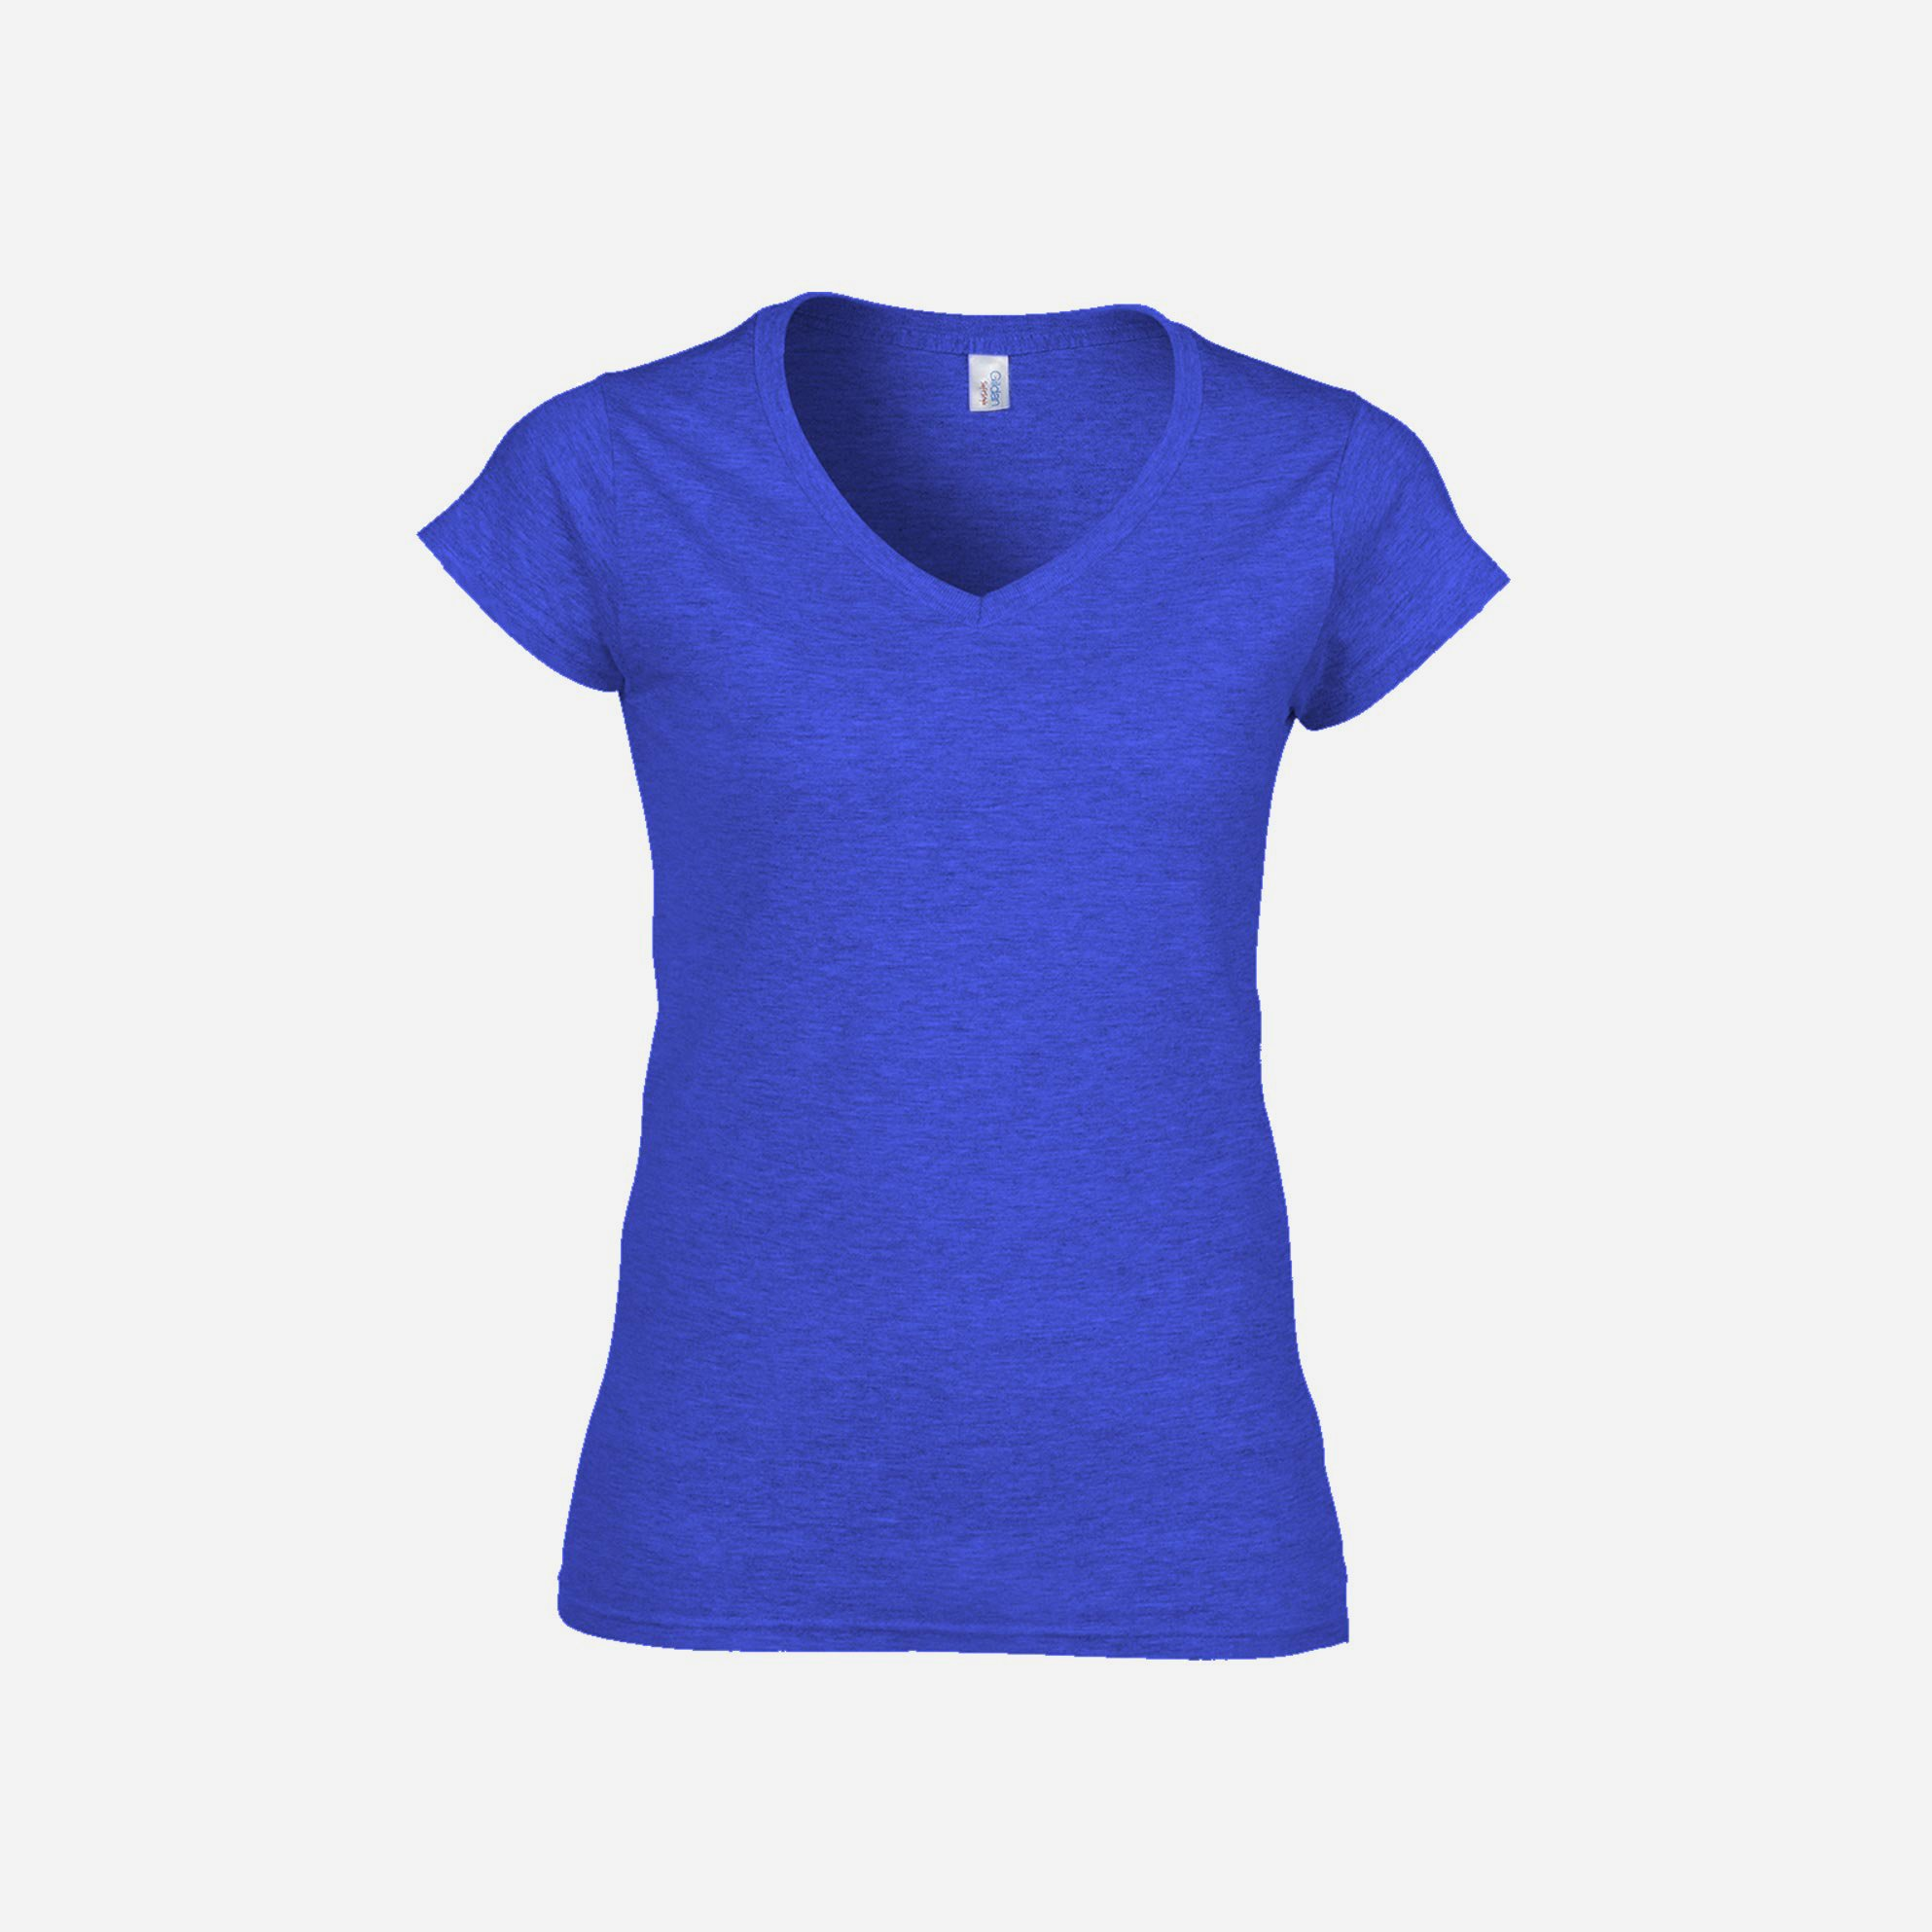 Camiseta Fotografia Mujer Mujer Mujer Fotografia Fotografia Mujer Camiseta Camiseta Camiseta Camiseta Fotografia IpIxgw8